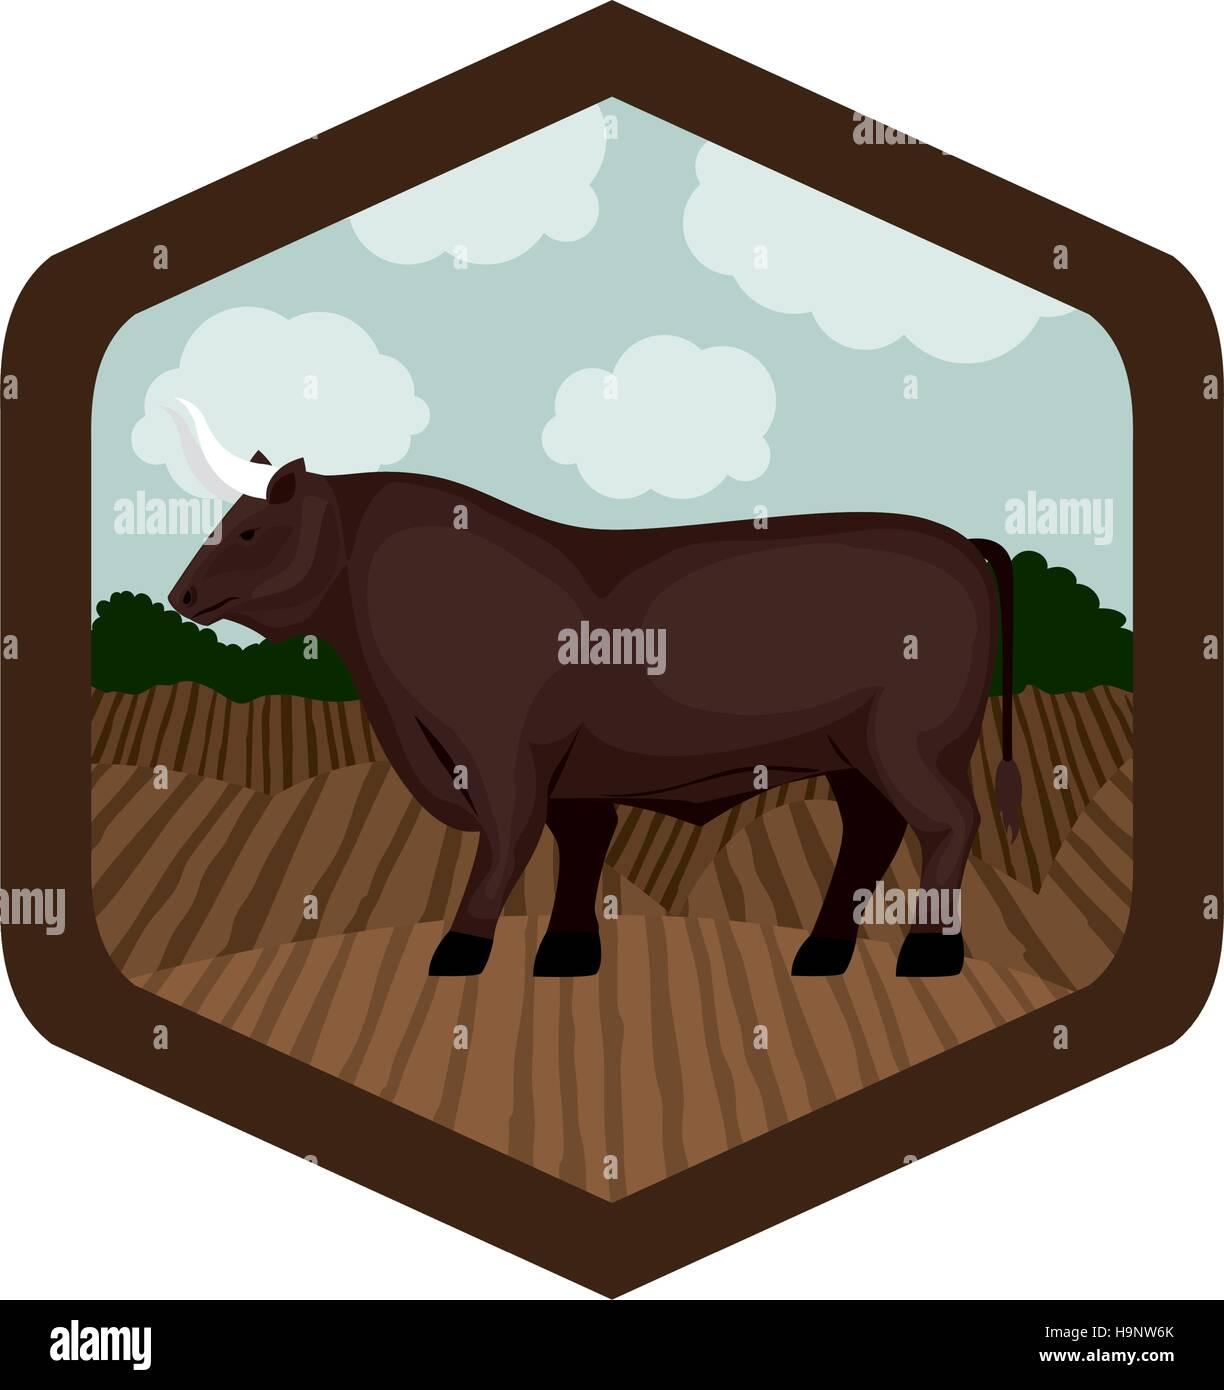 Isolierte Bull Tier in Rahmenkonstruktion Vektor Abbildung - Bild ...